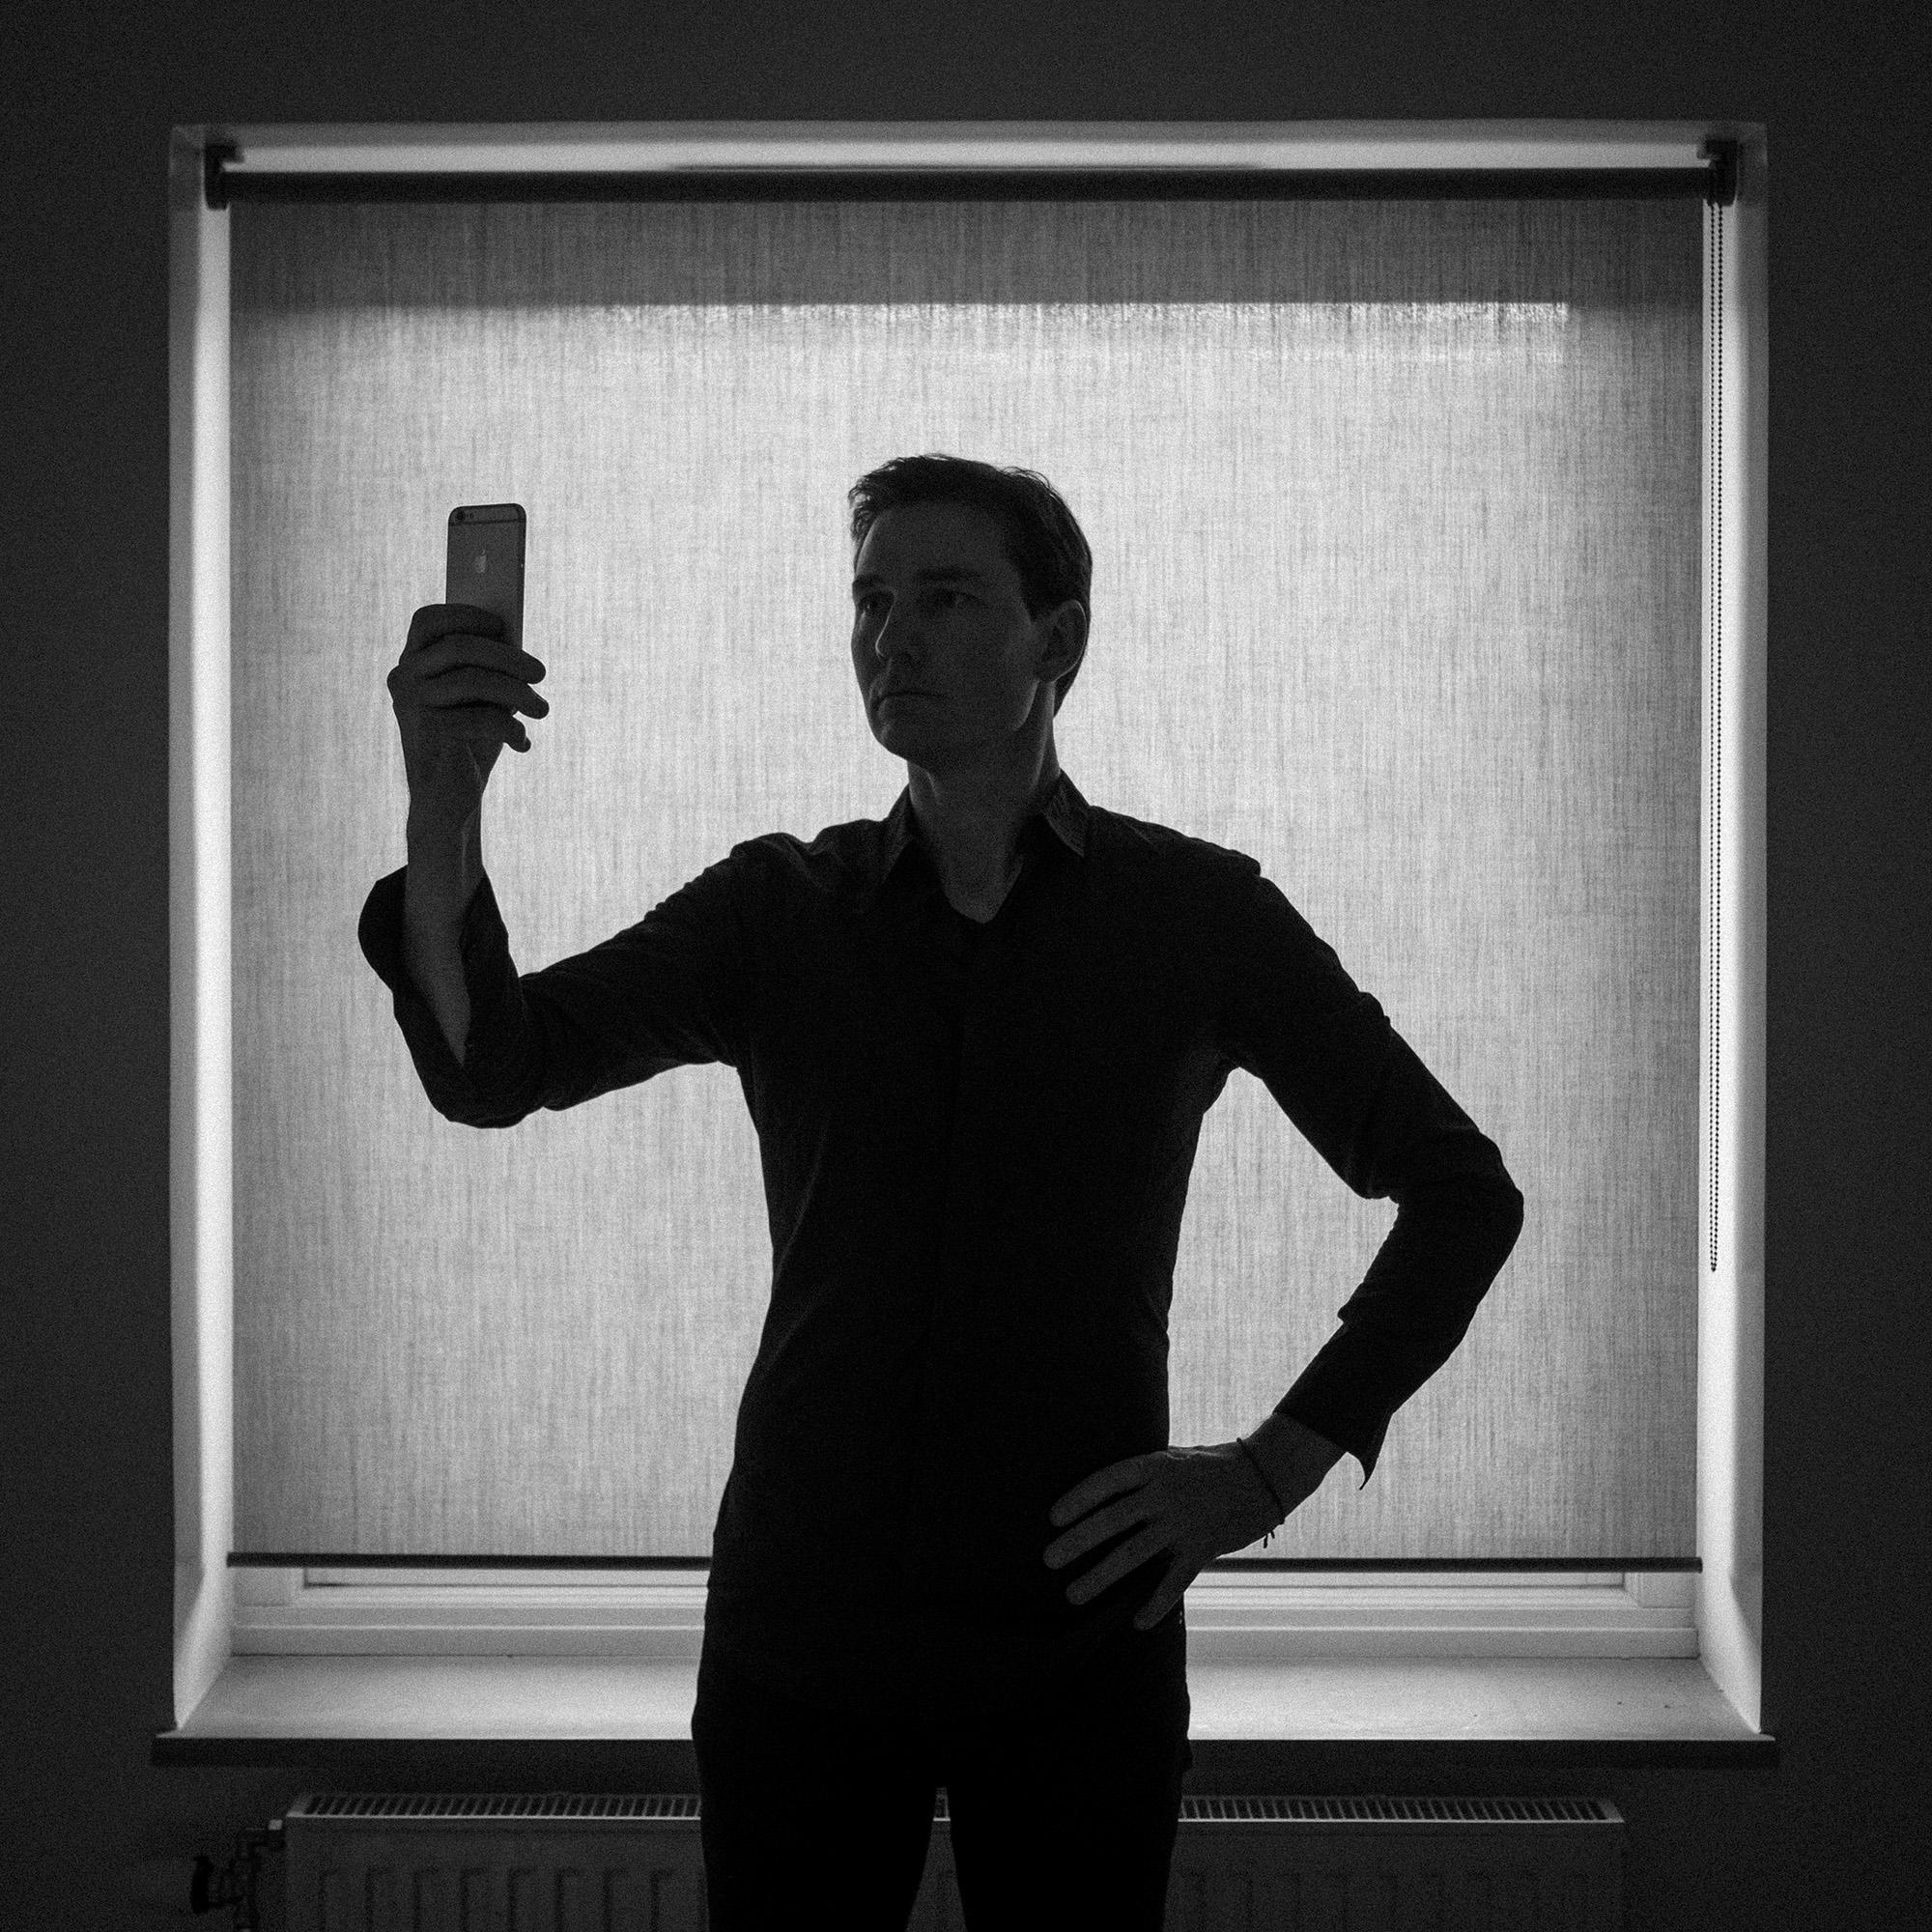 Introspective Selfie